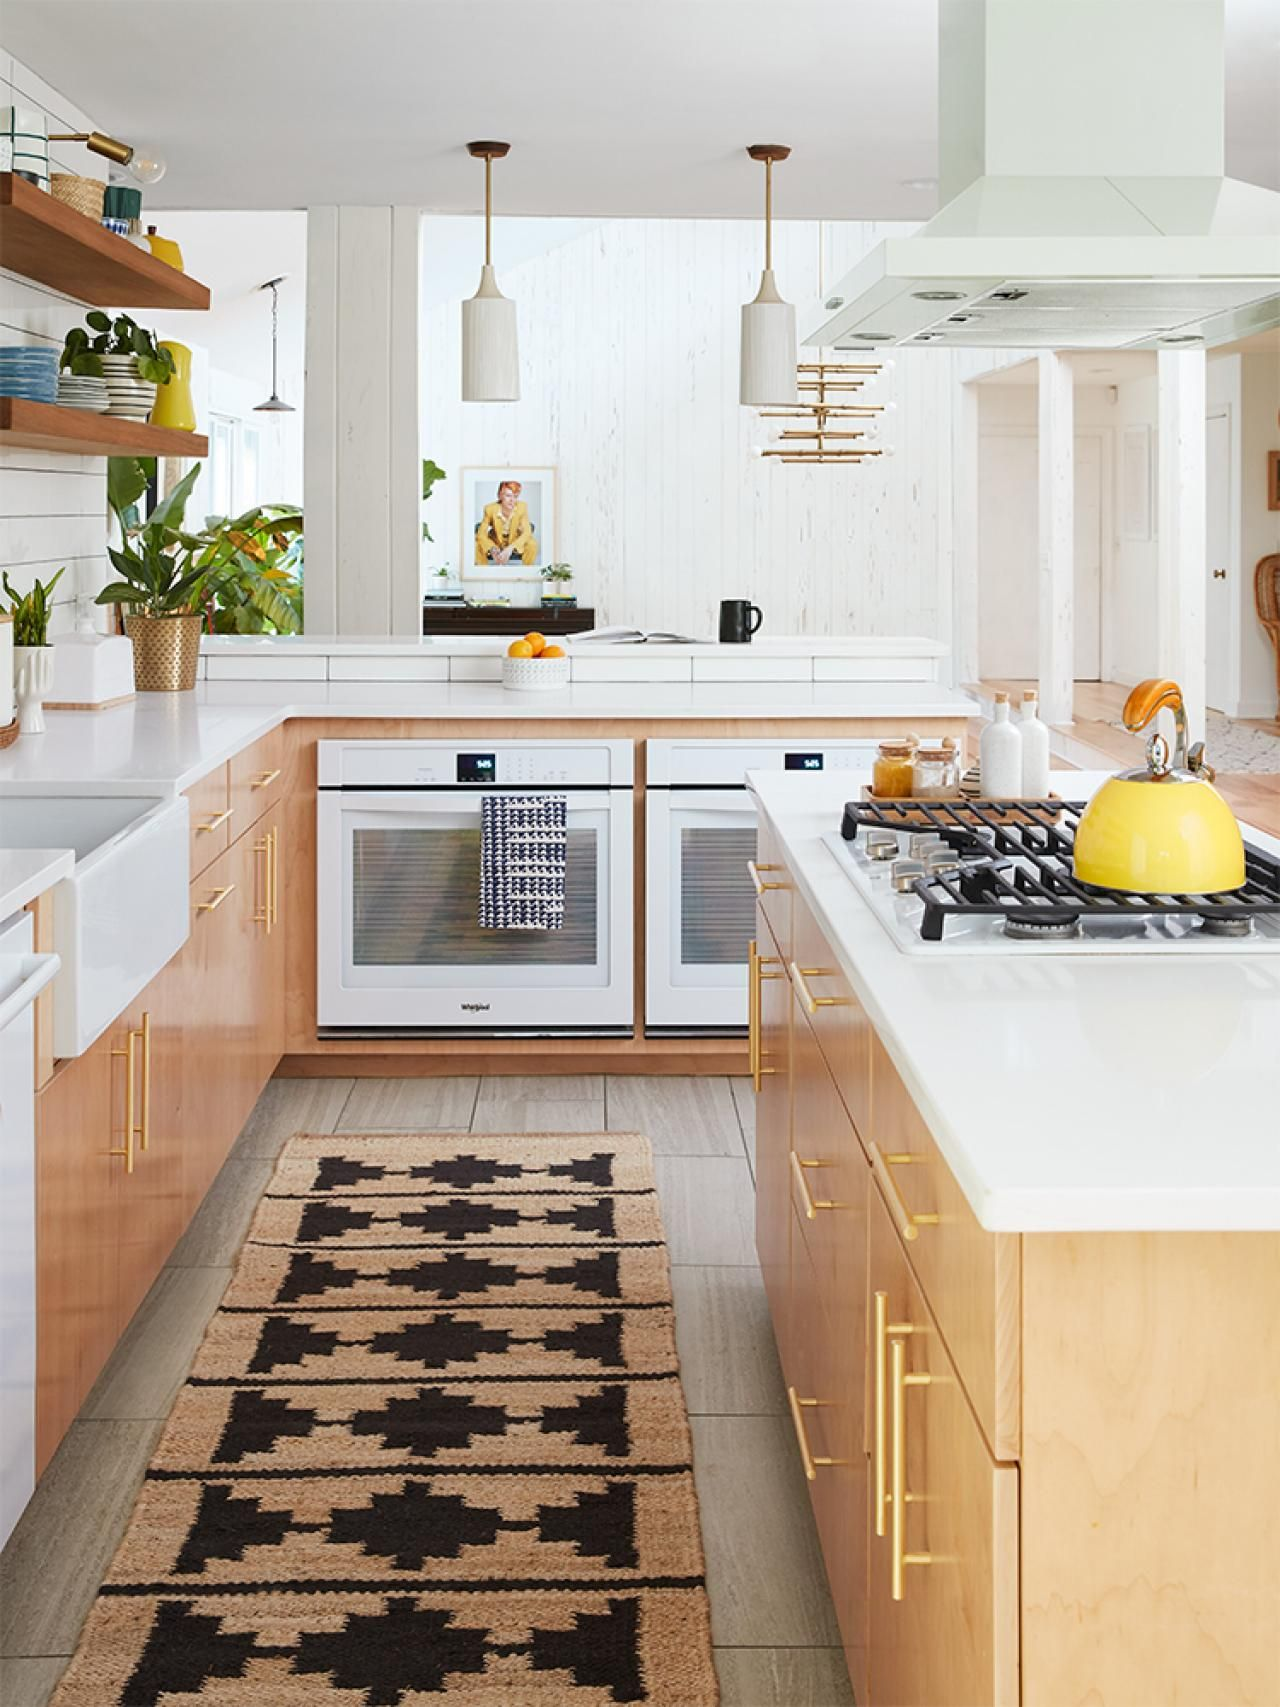 A Bright, Light Kitchen Makeover | Remodel in 2019 | Kitchen ...